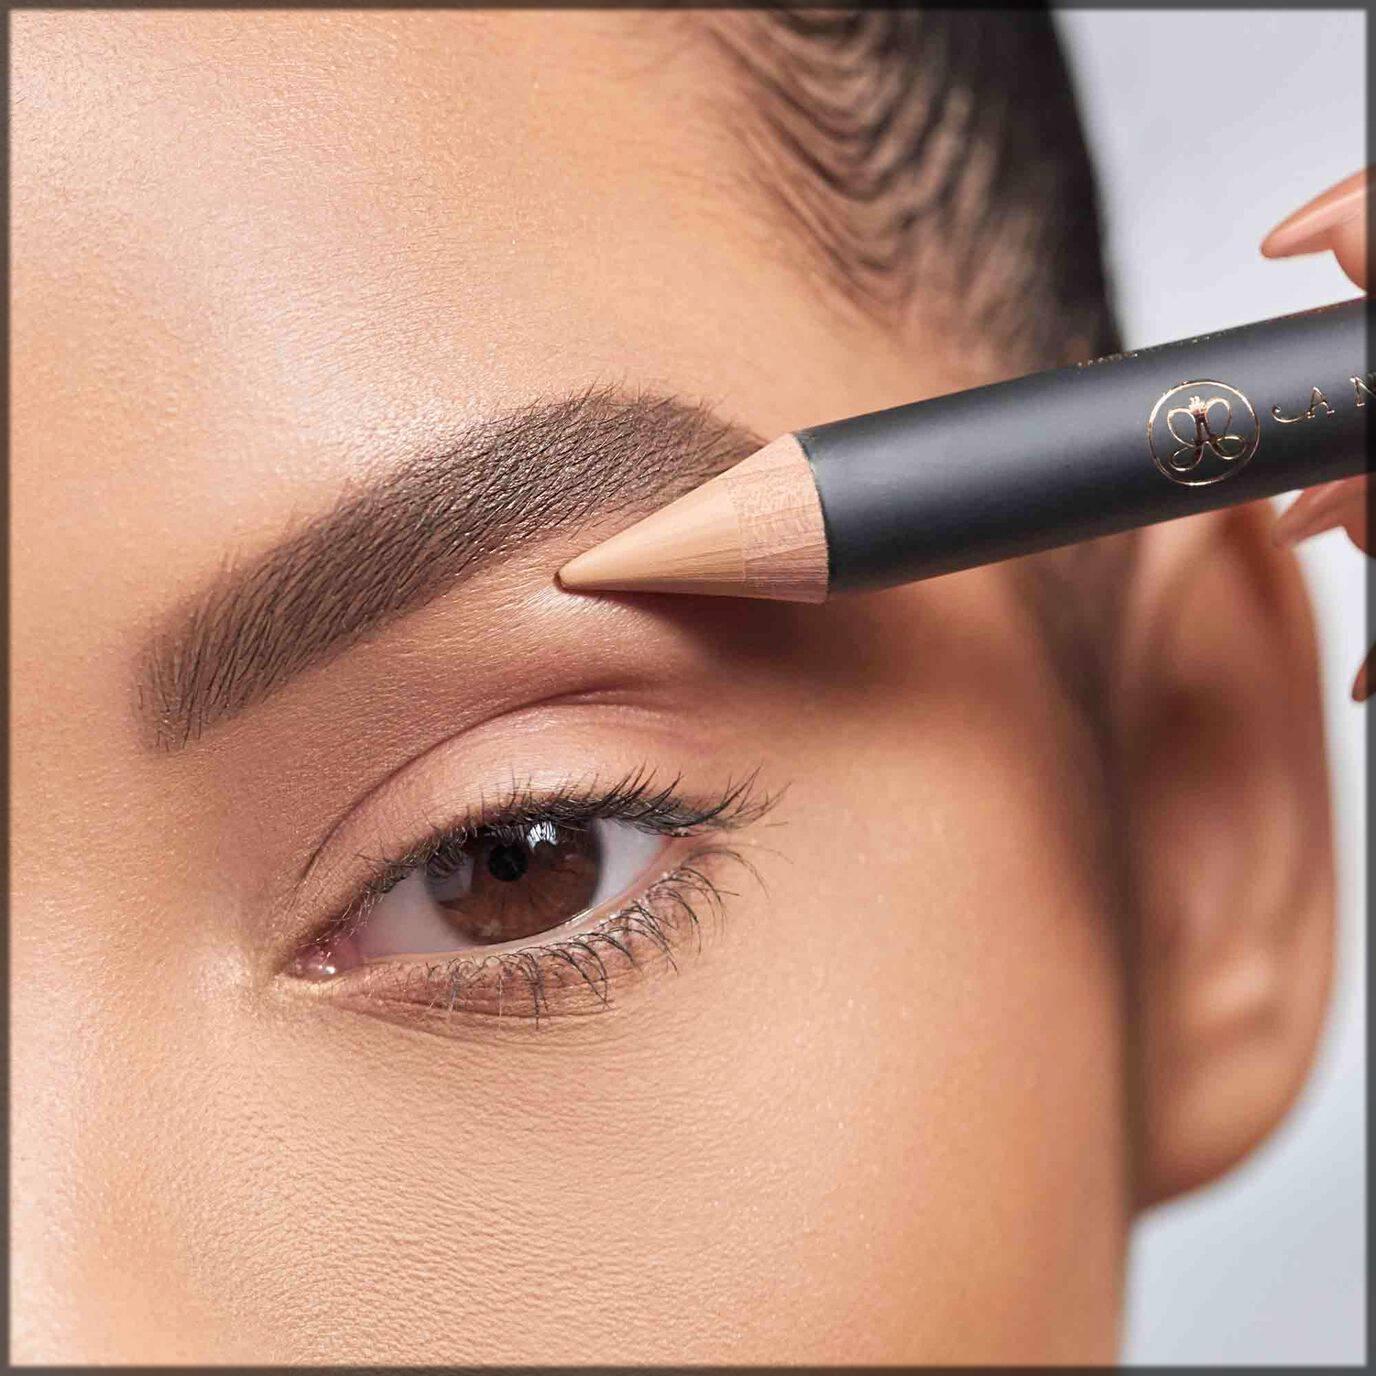 arabic eye makeup tutorial - step 1